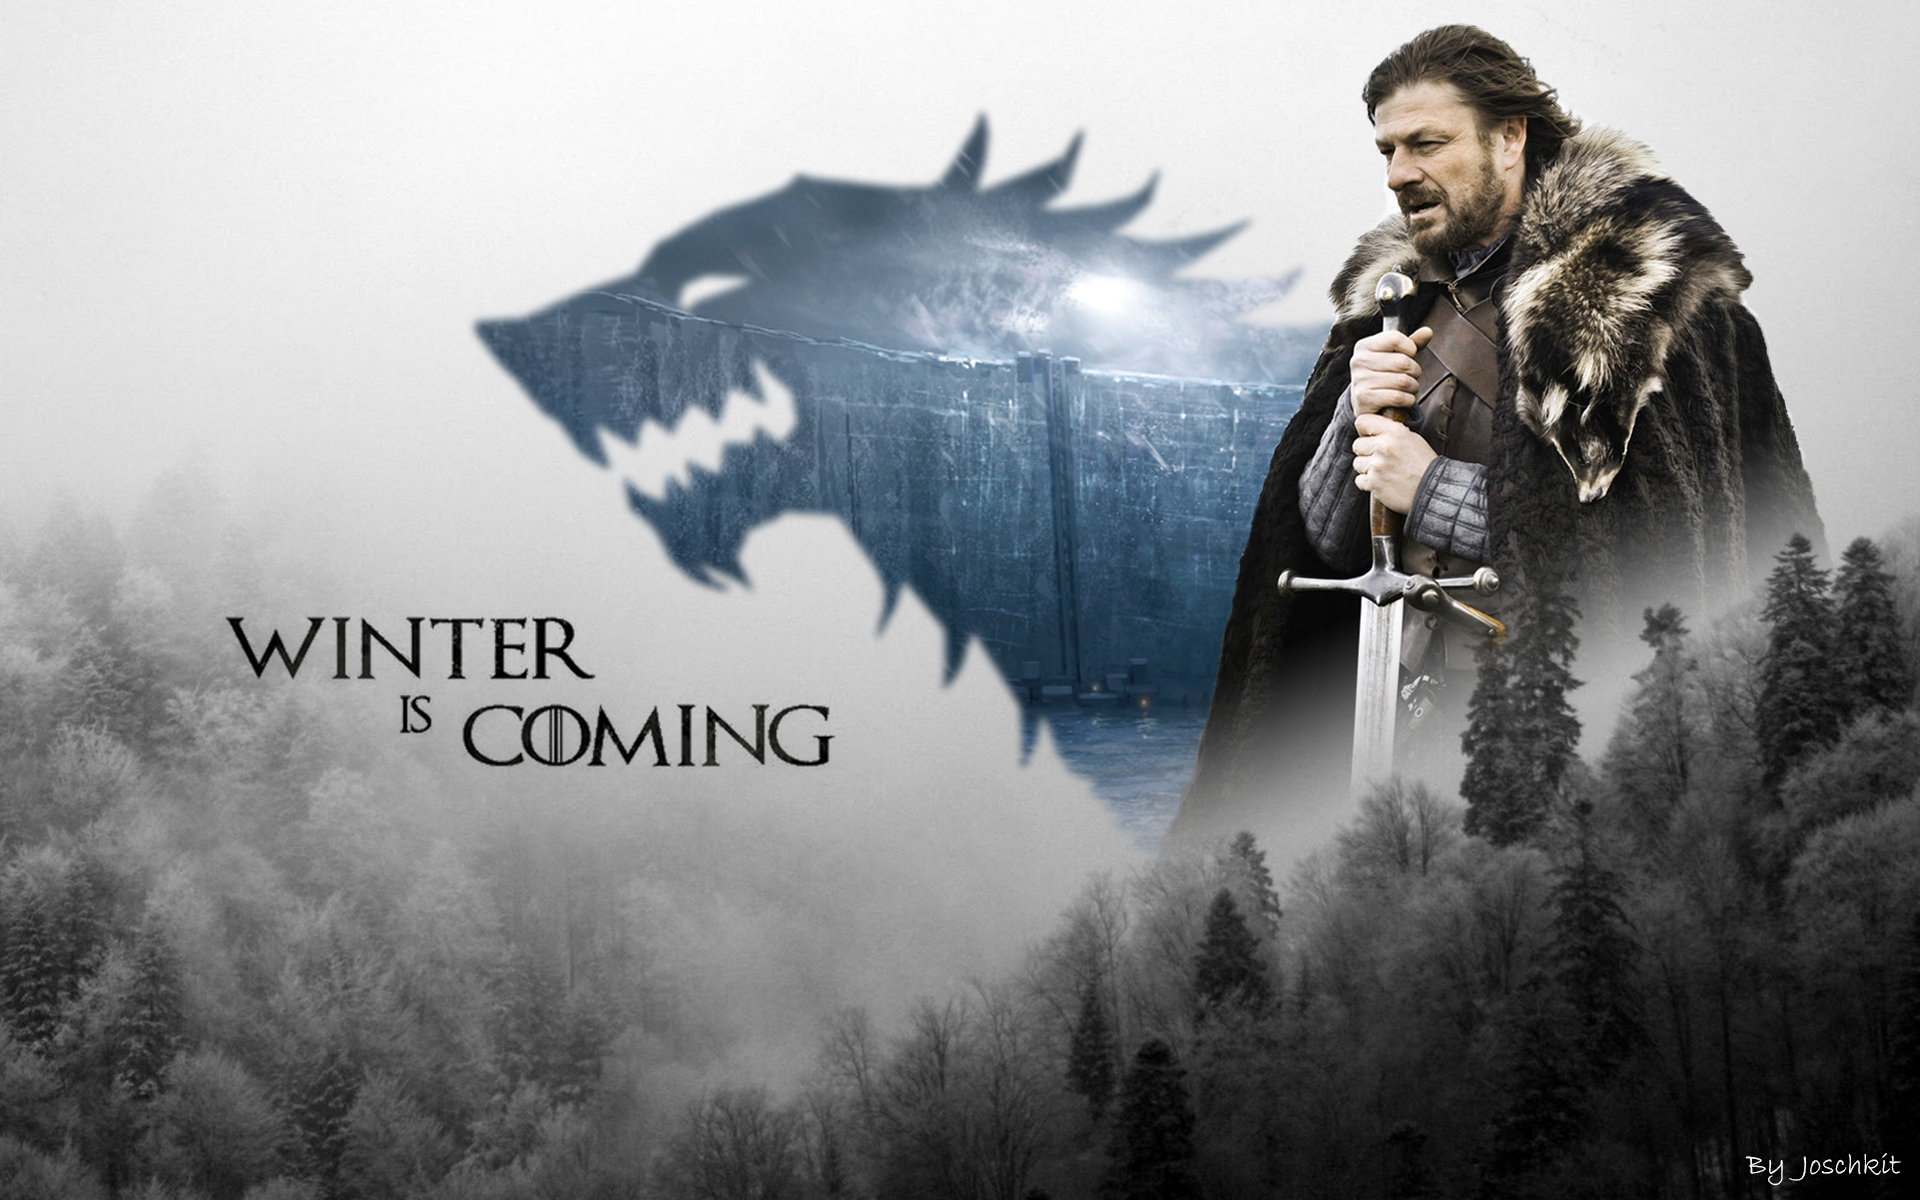 Game Of Thrones Wallpaper Eddard Stark By Joschkit On Deviantart